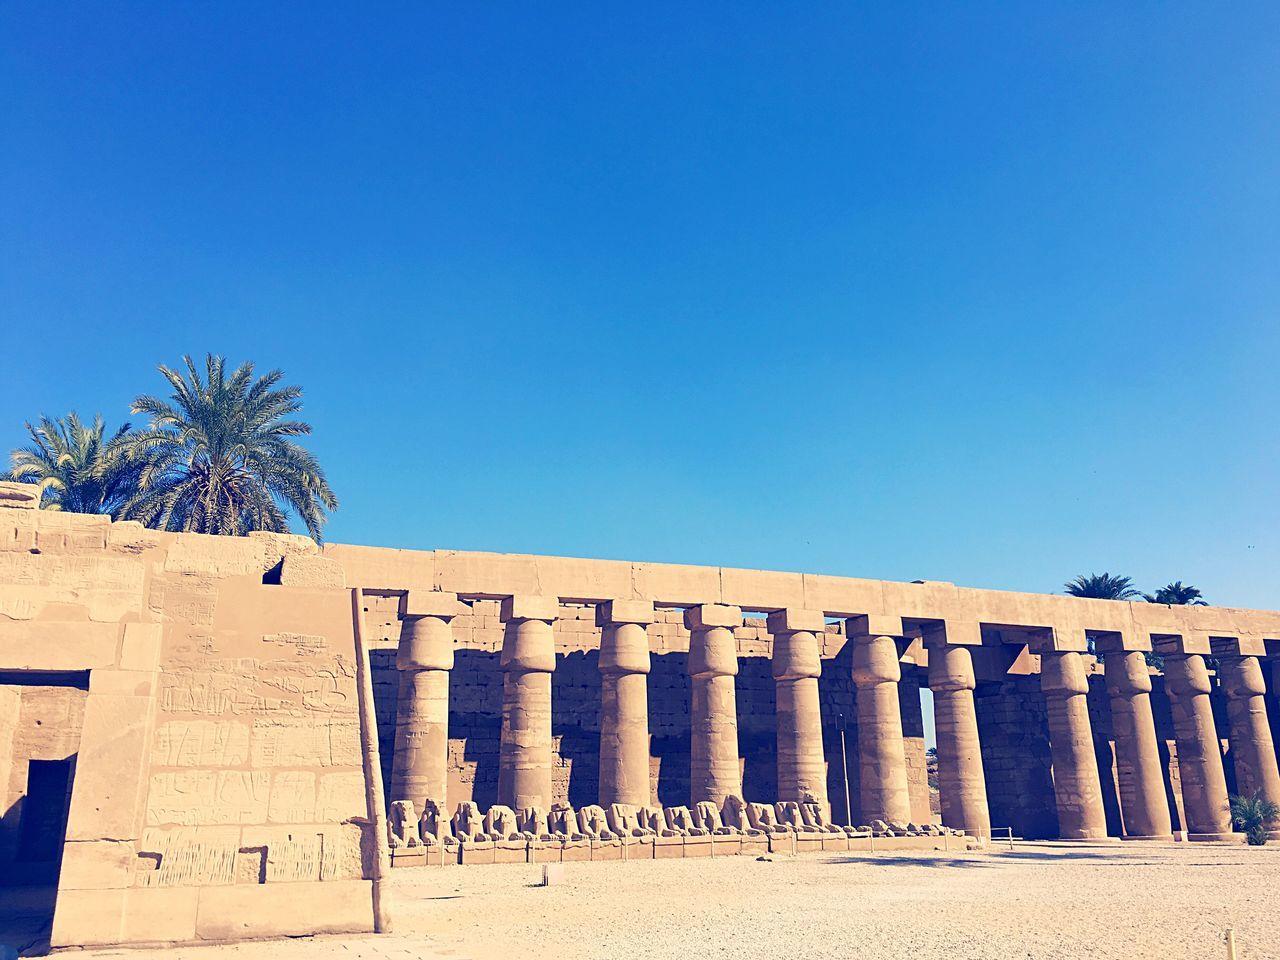 Ancient Culture ⚱️🏺 Luxor Karnak Temple Egypt Ägypten  RedSea Reisen Ancient Culture DOPE Pharaoh Temple Tempel Karnak Karnaktemple Globetrotter Travel Traveling Reise Aroundtheworld Vacations Vacation Destination Vacation Time Vacation Arabic египет